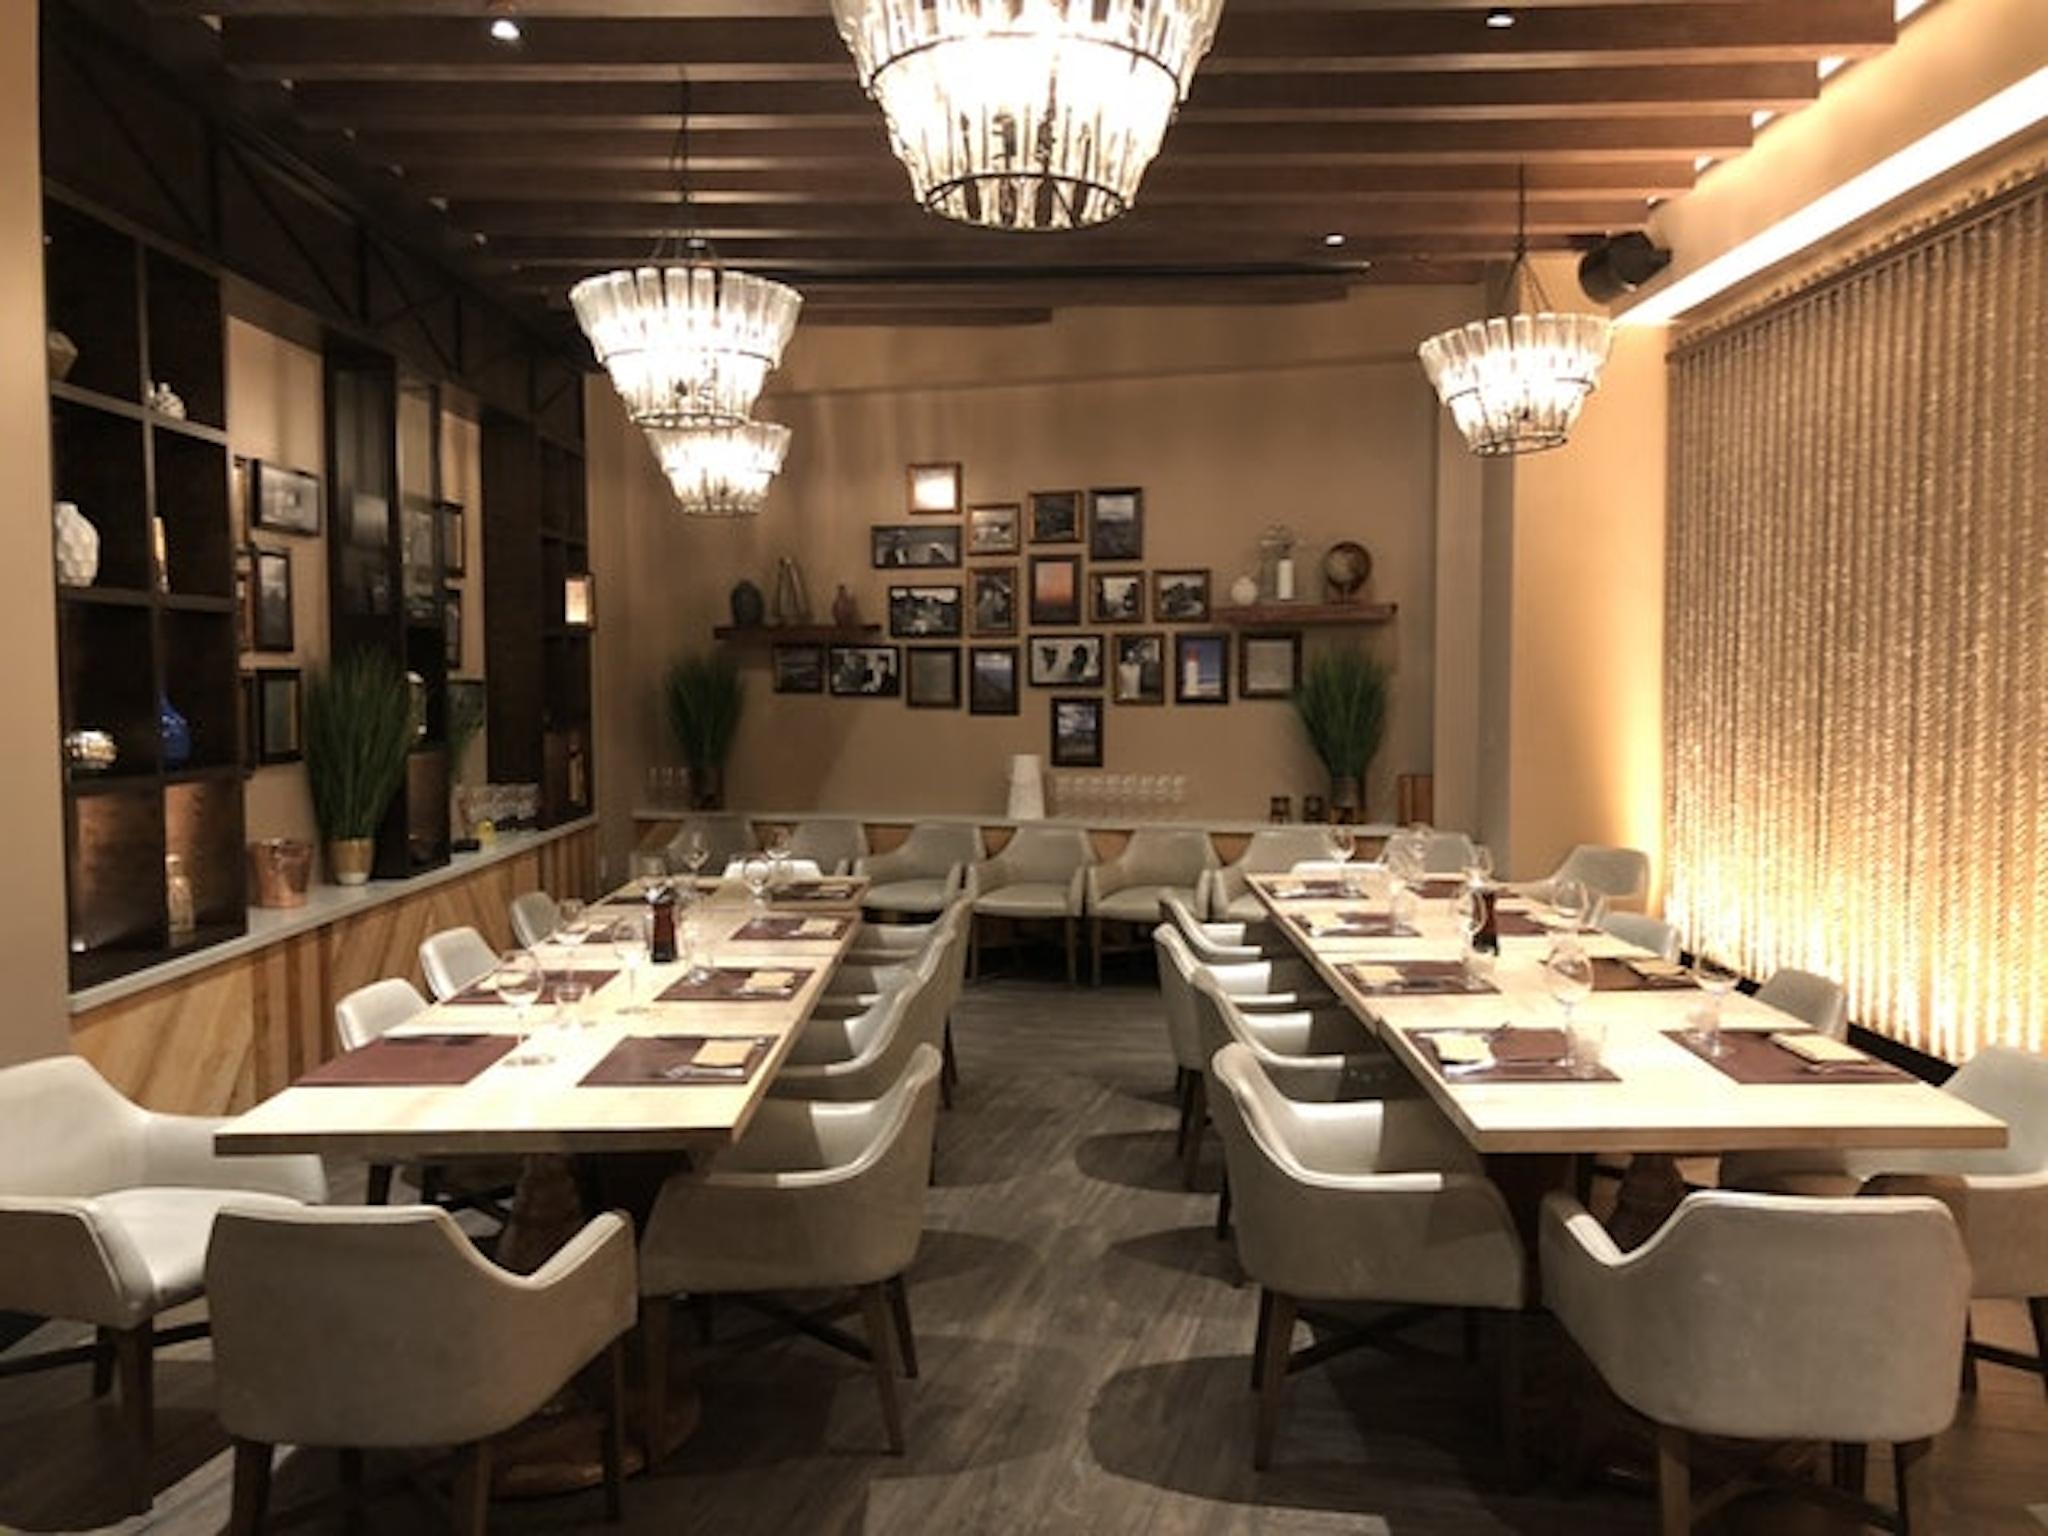 Dining room at Big Easy Winebar & Grill